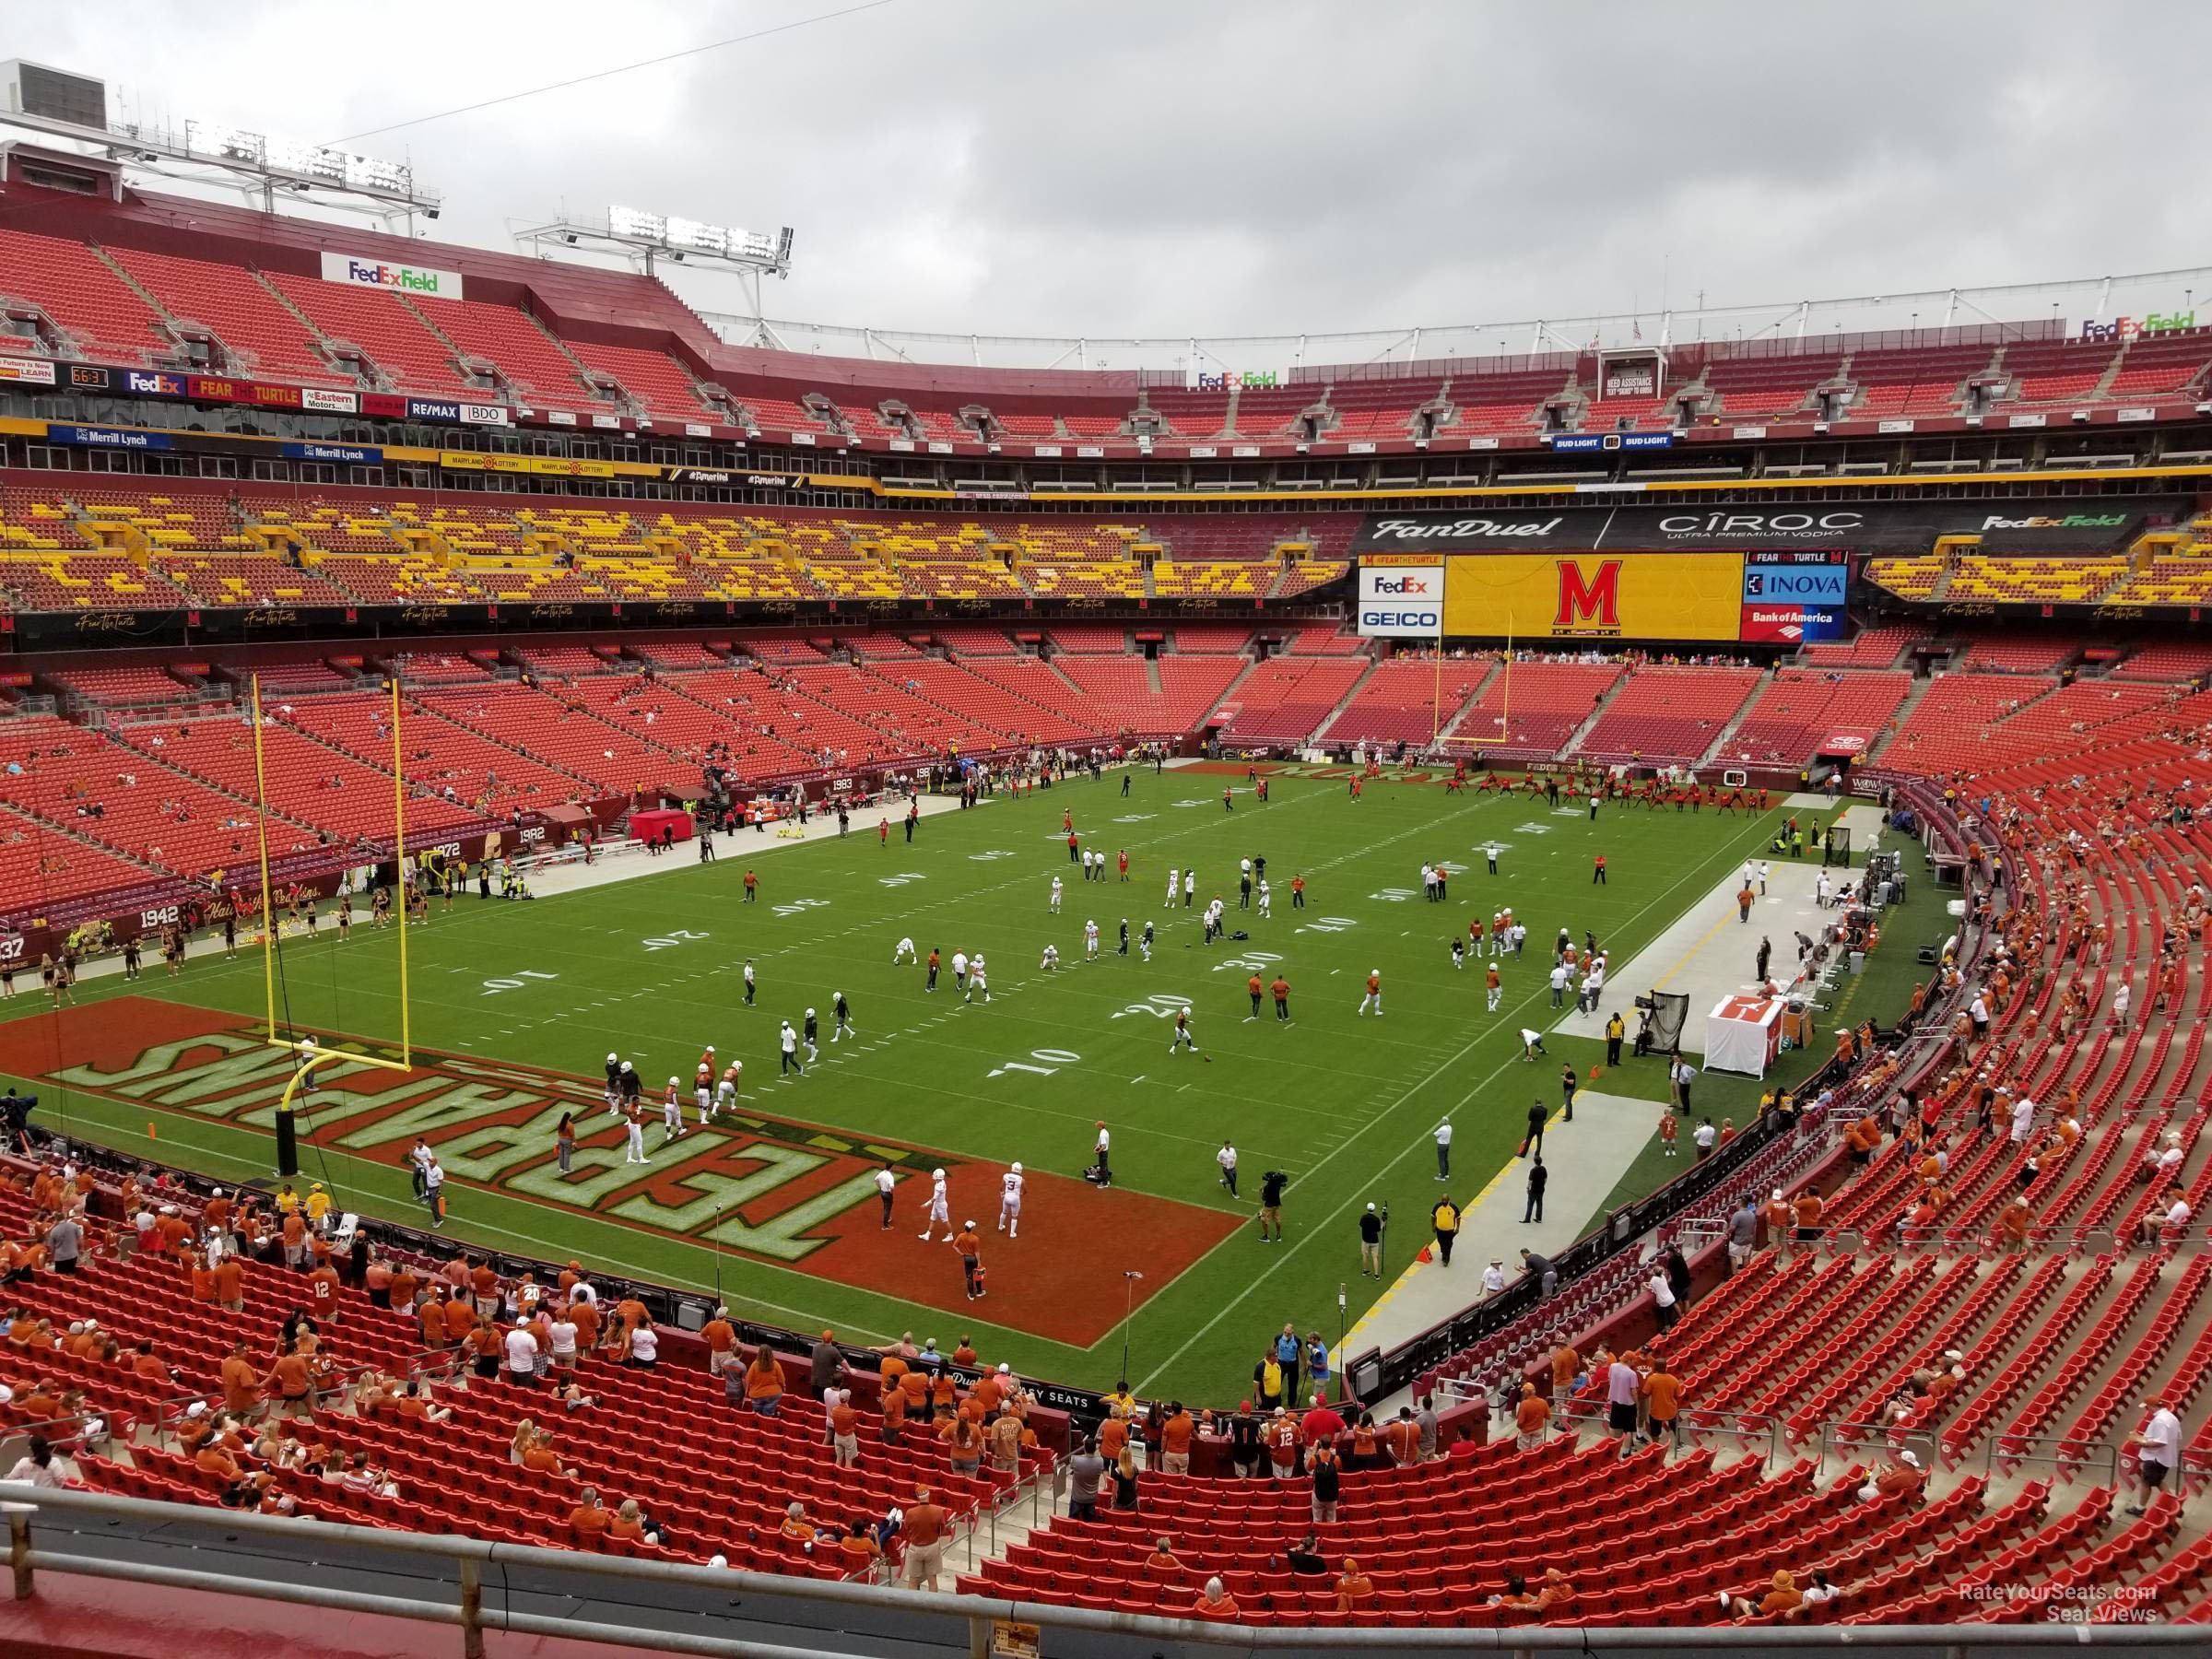 Zone D Club 329 seat view